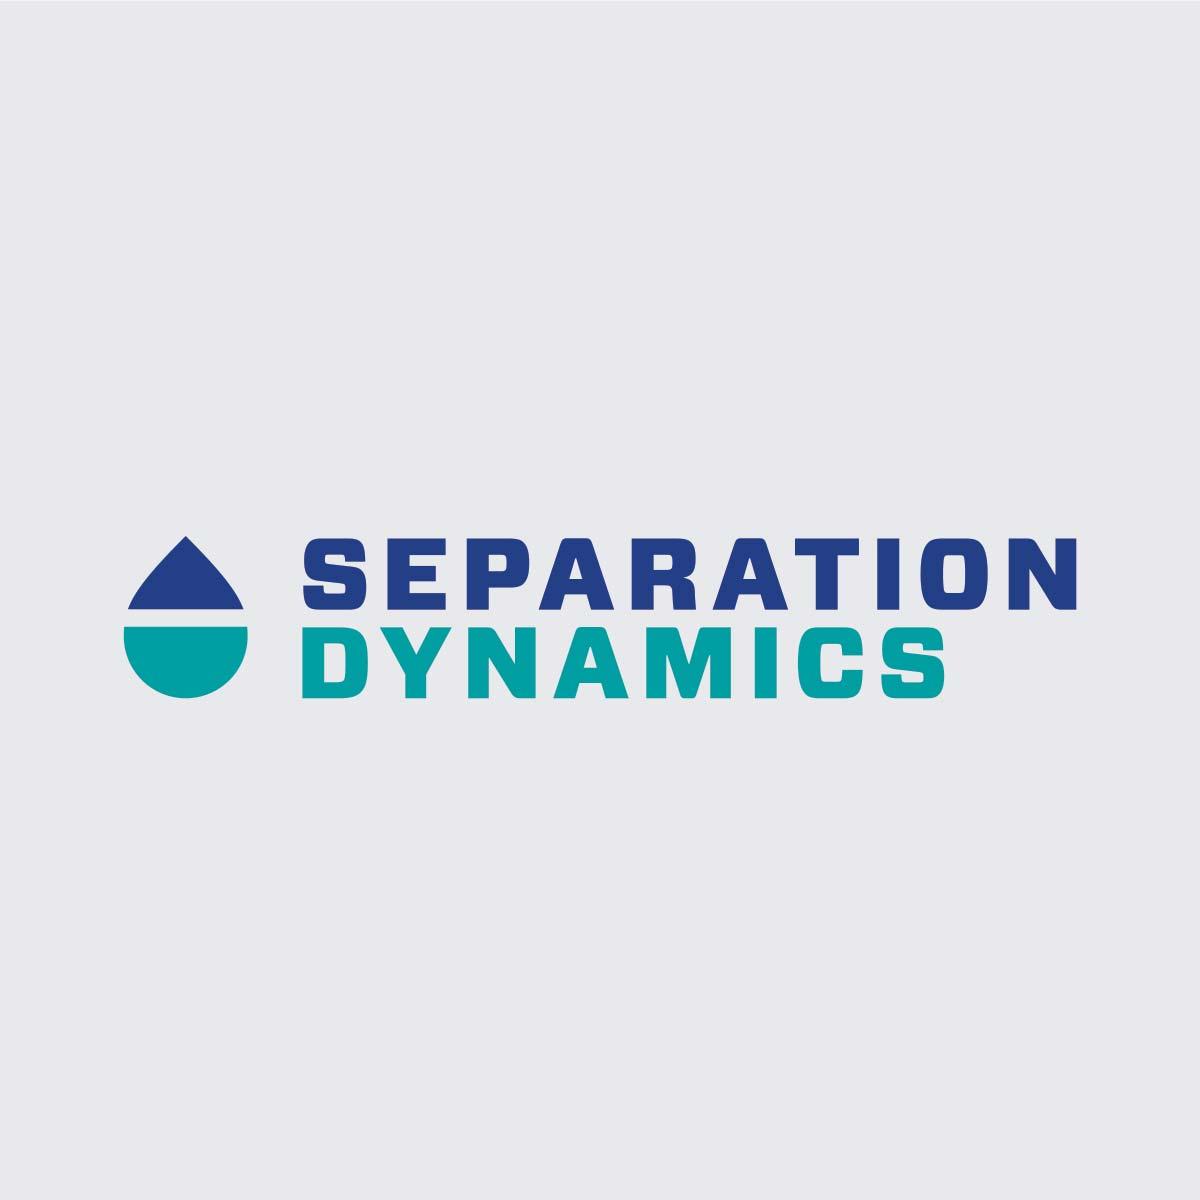 Separation Dynamics alternative logo lockup